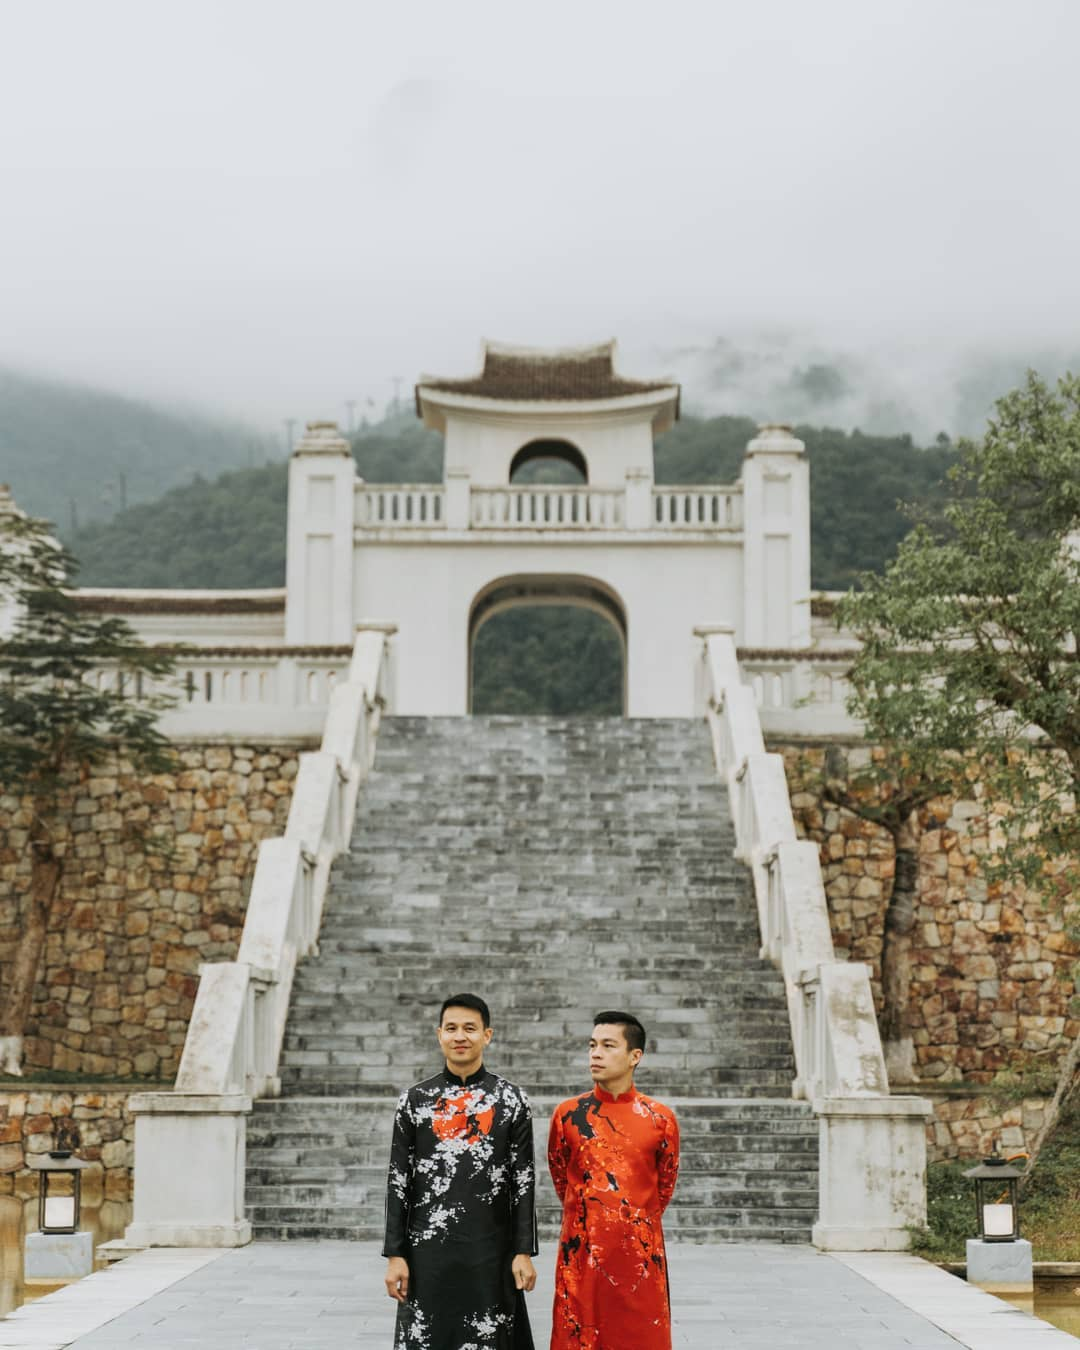 Quang-ninh-legacy-yen-tu-32